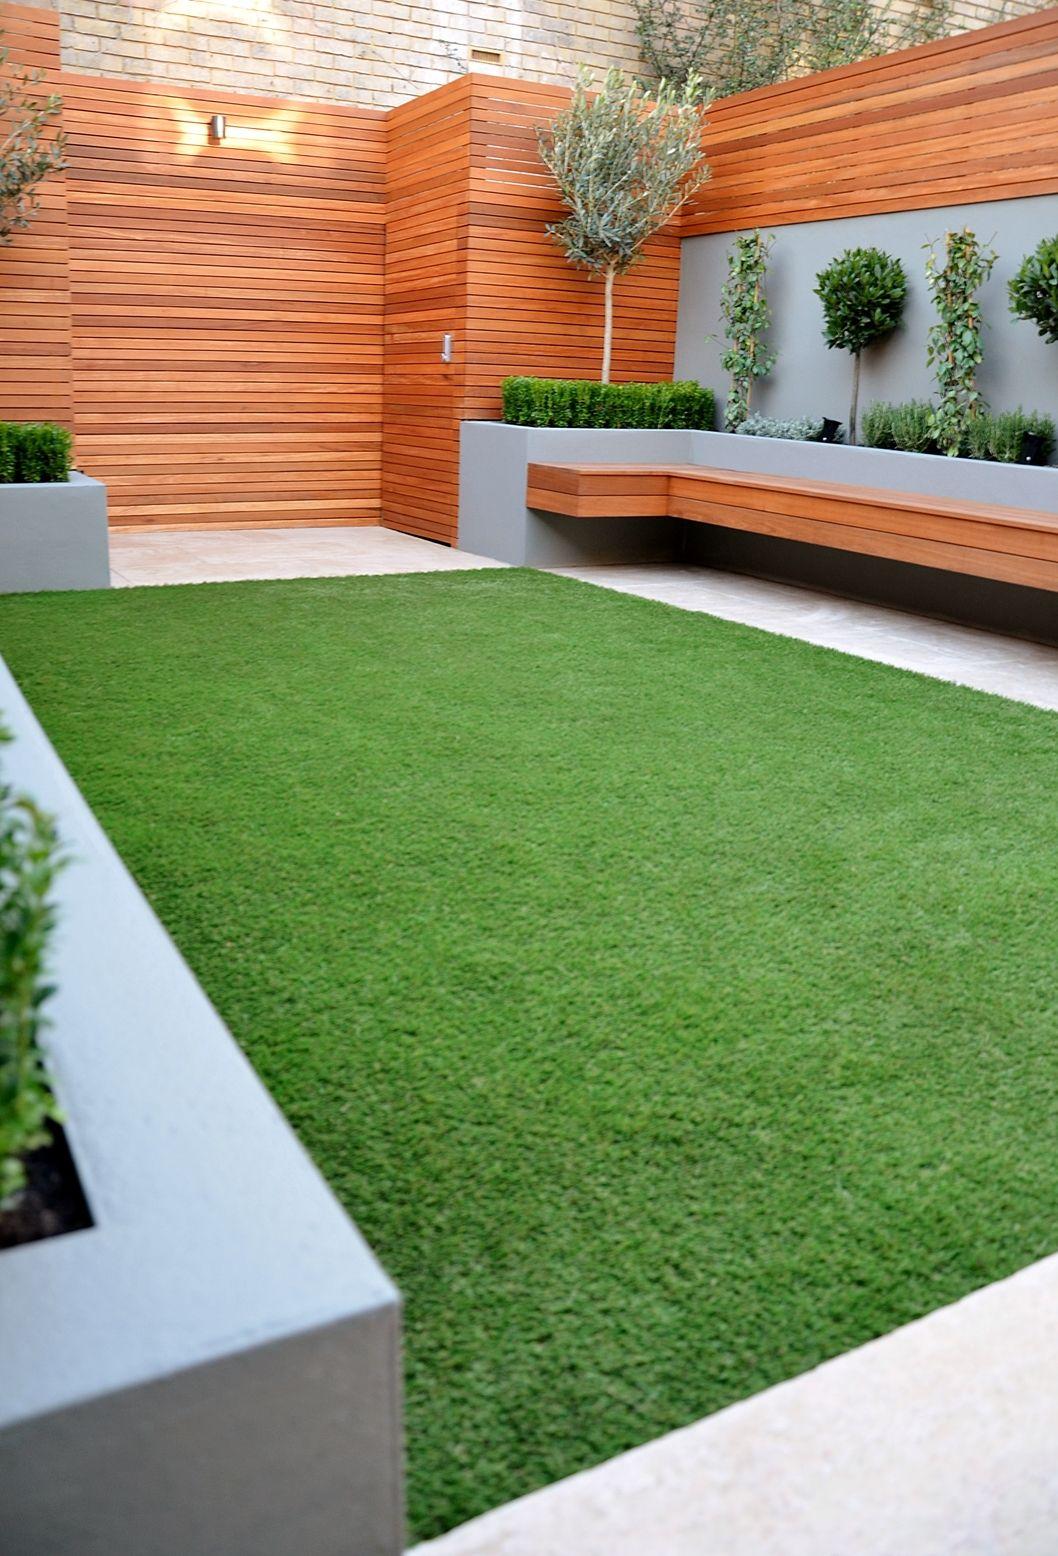 Photo of modern small agdren design ideas anewgarden london